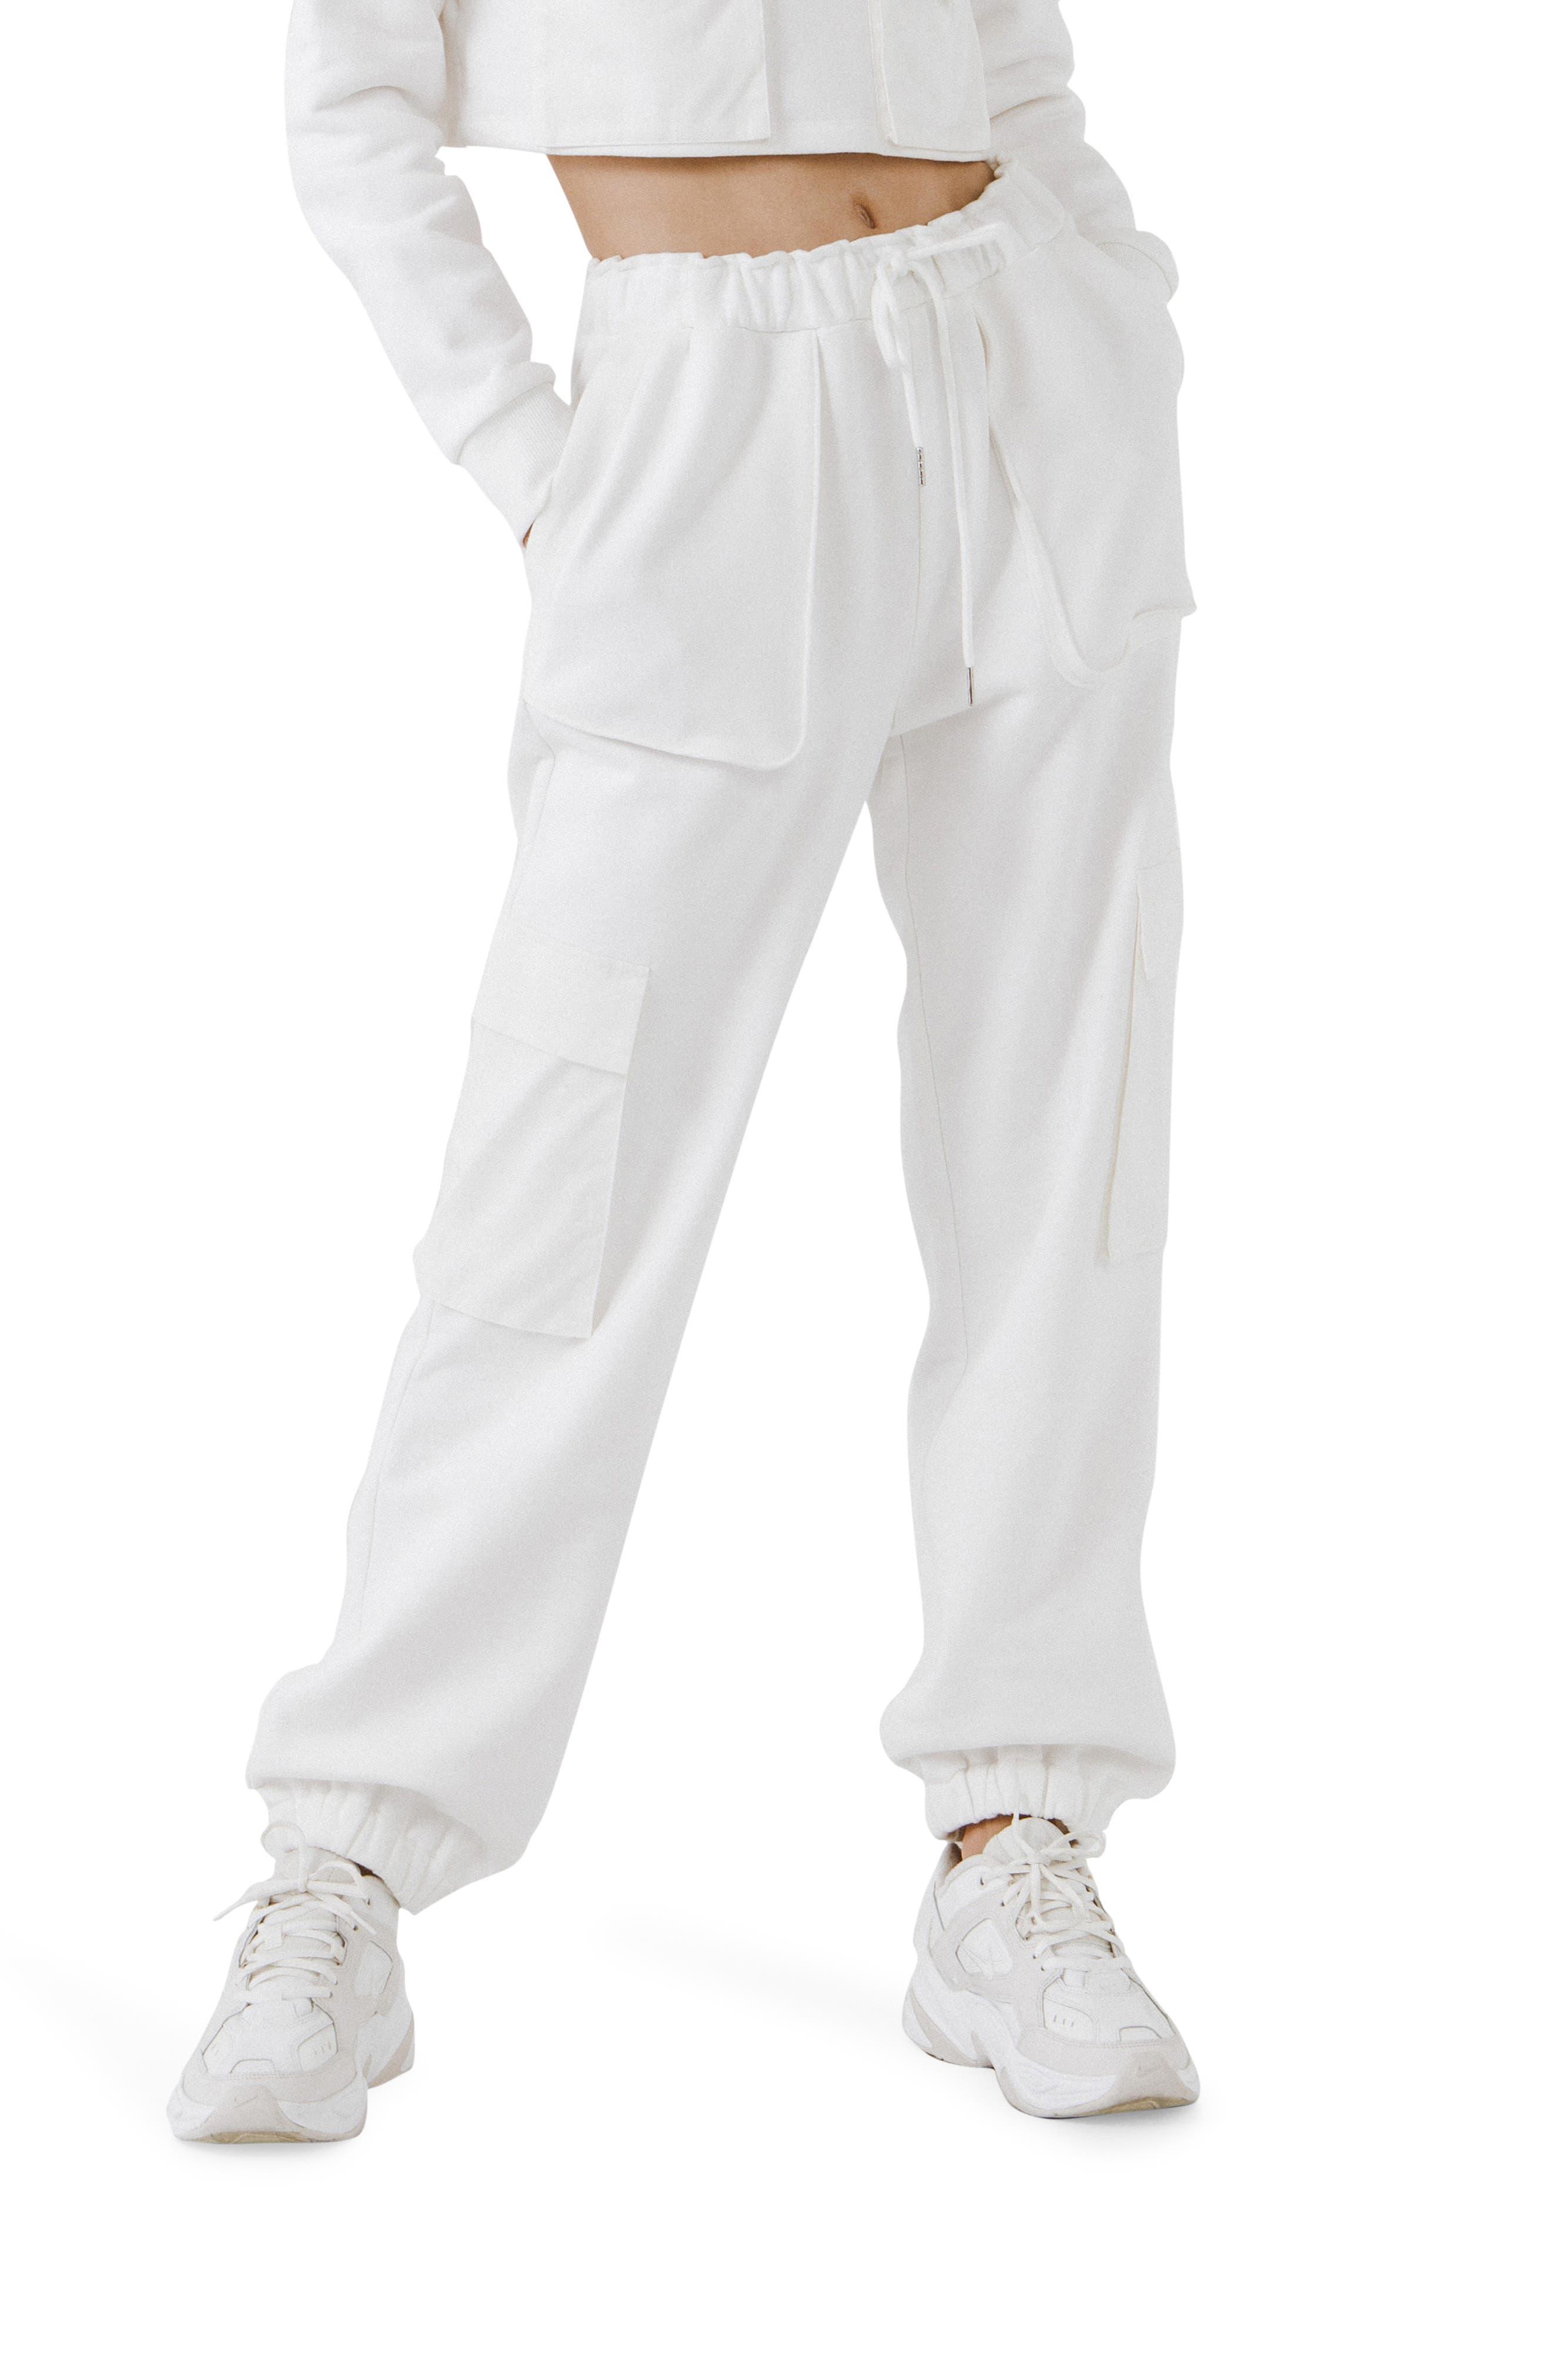 Pocket Loungewear Cotton Joggers